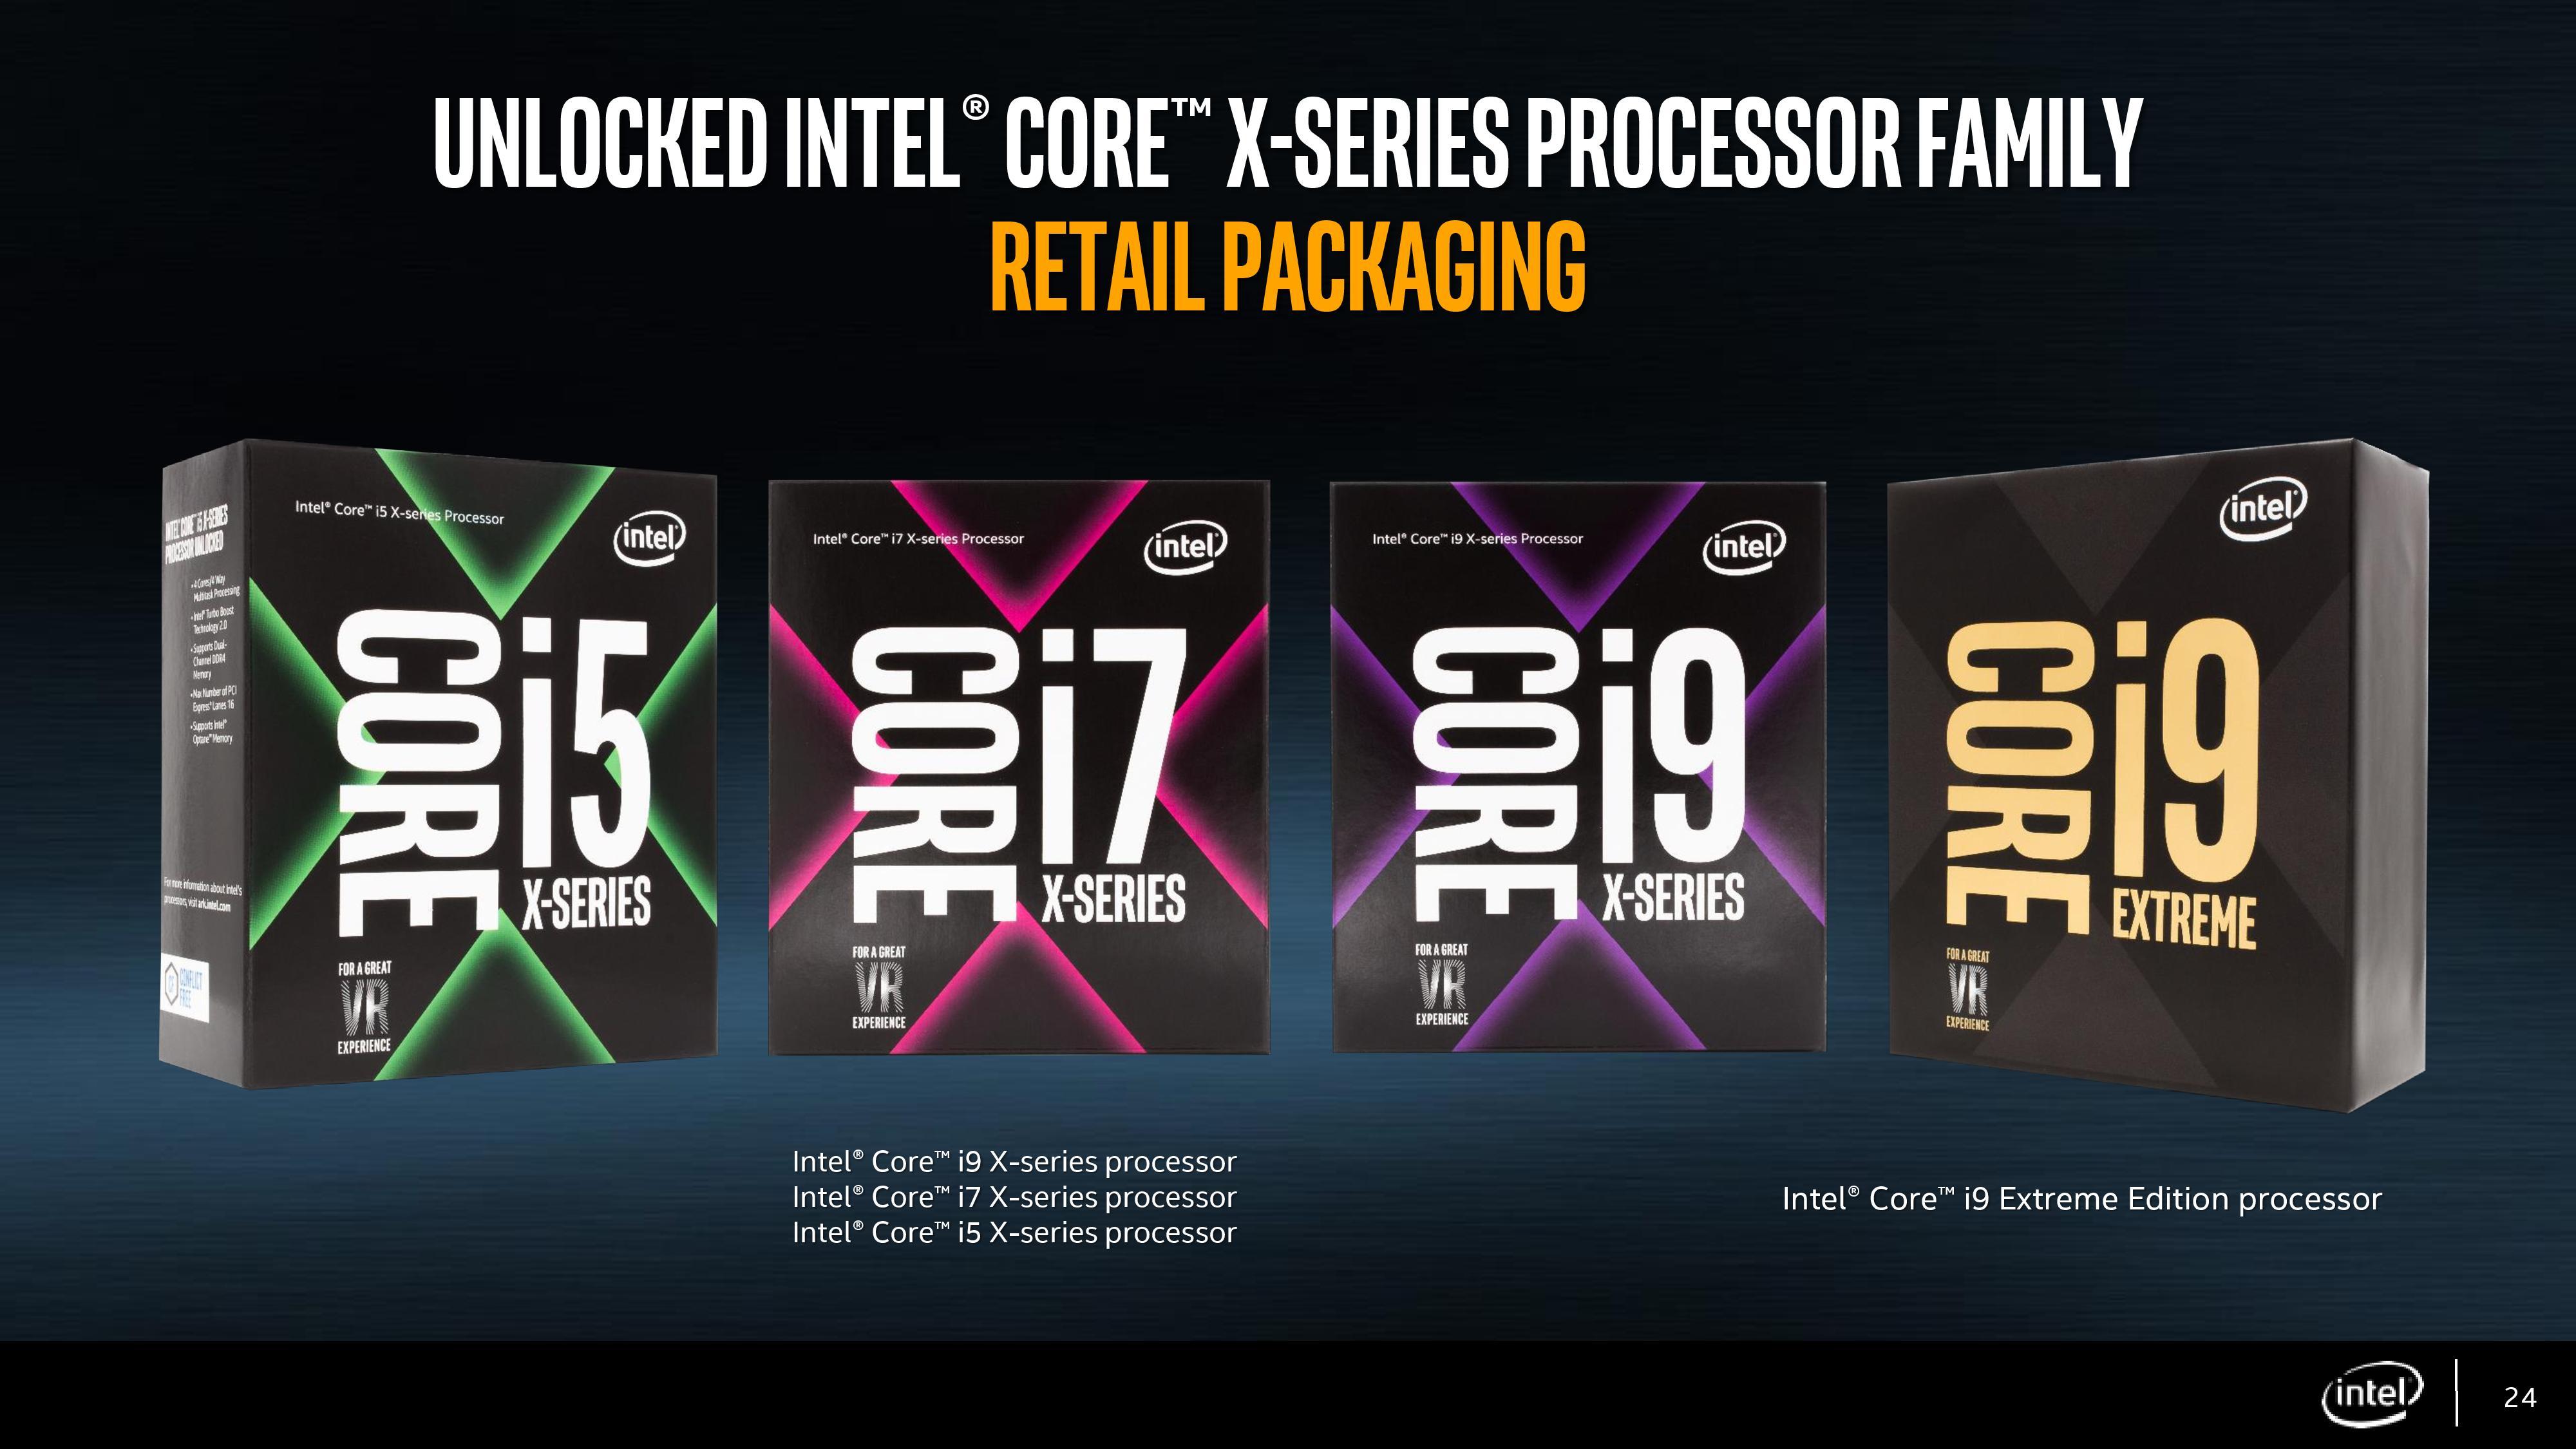 Prosesor intel core i9 harga dan spesifikasi